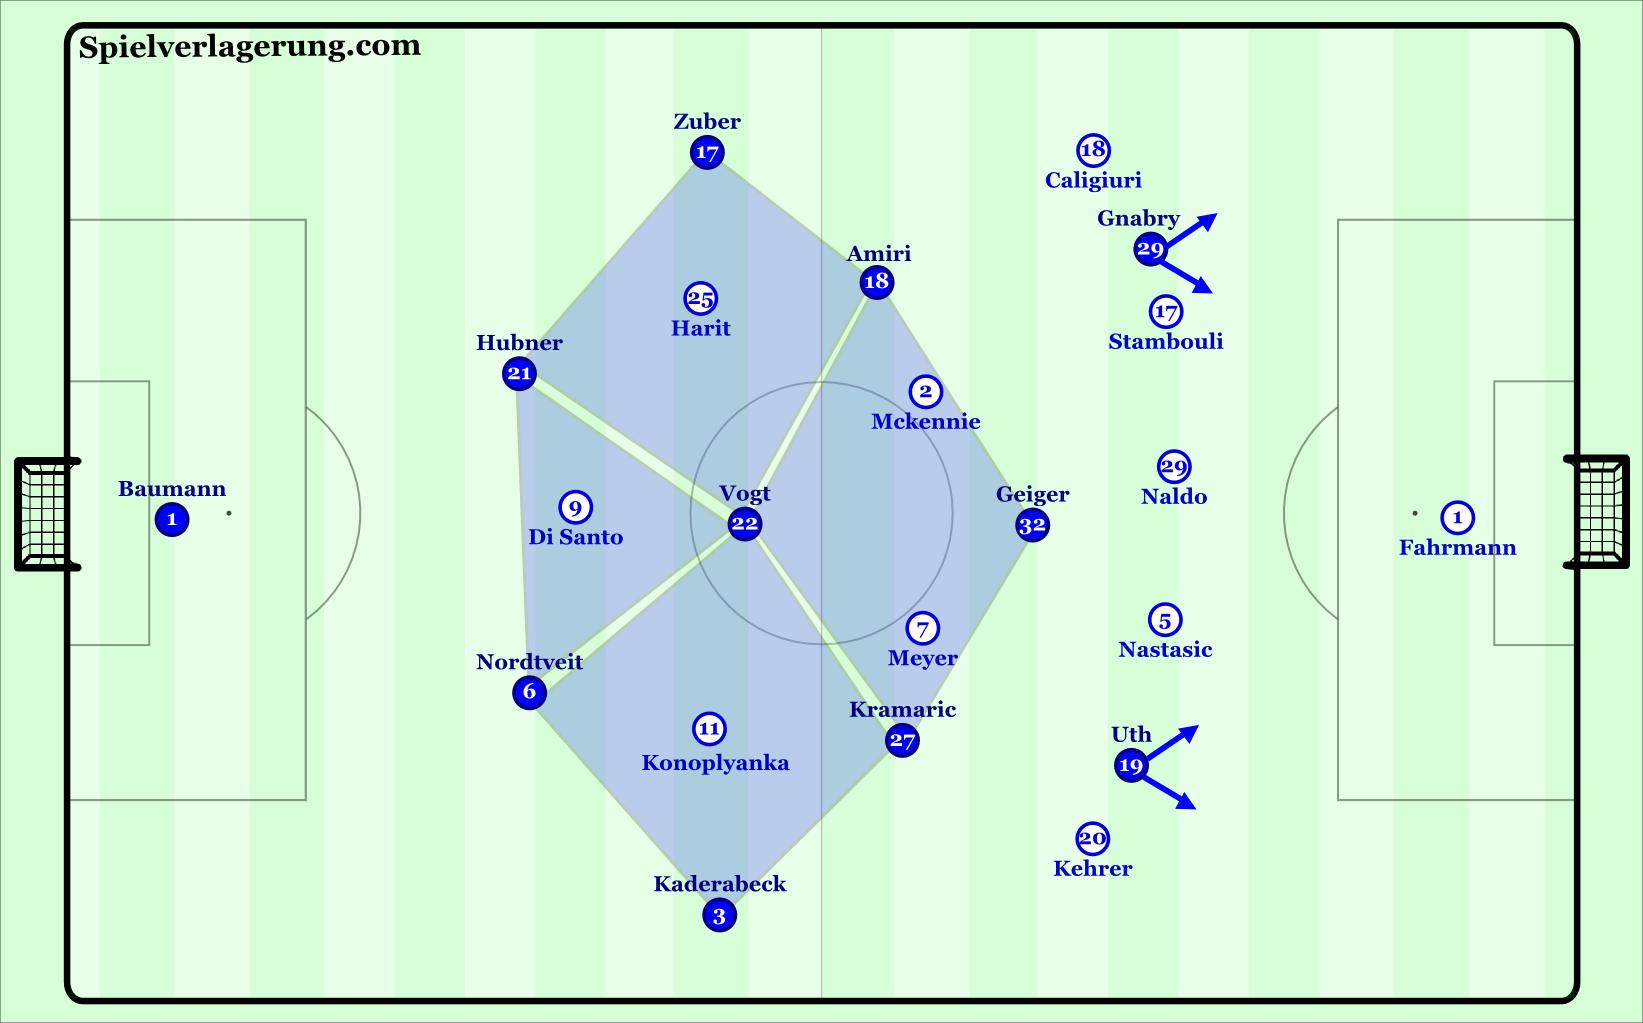 Hoffenheim's 2-3-3-2 structure